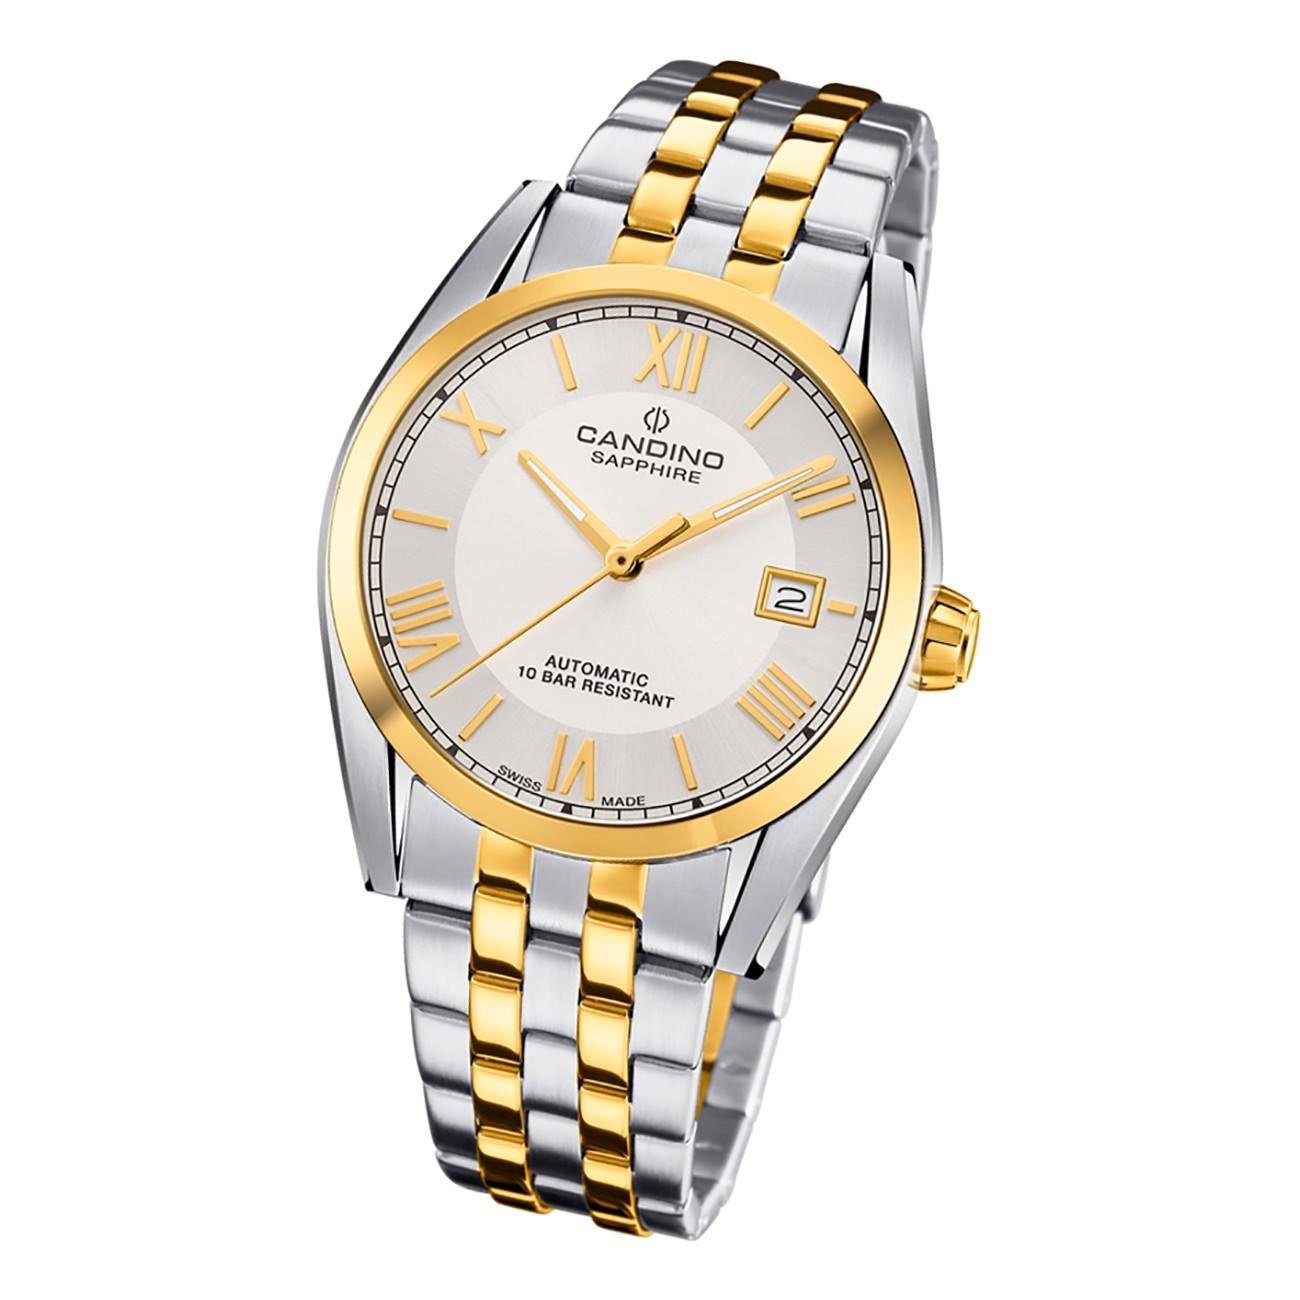 Candino Herren Armbanduhr Automatik C4702/1 Edelstahl silber gold UC4702/1